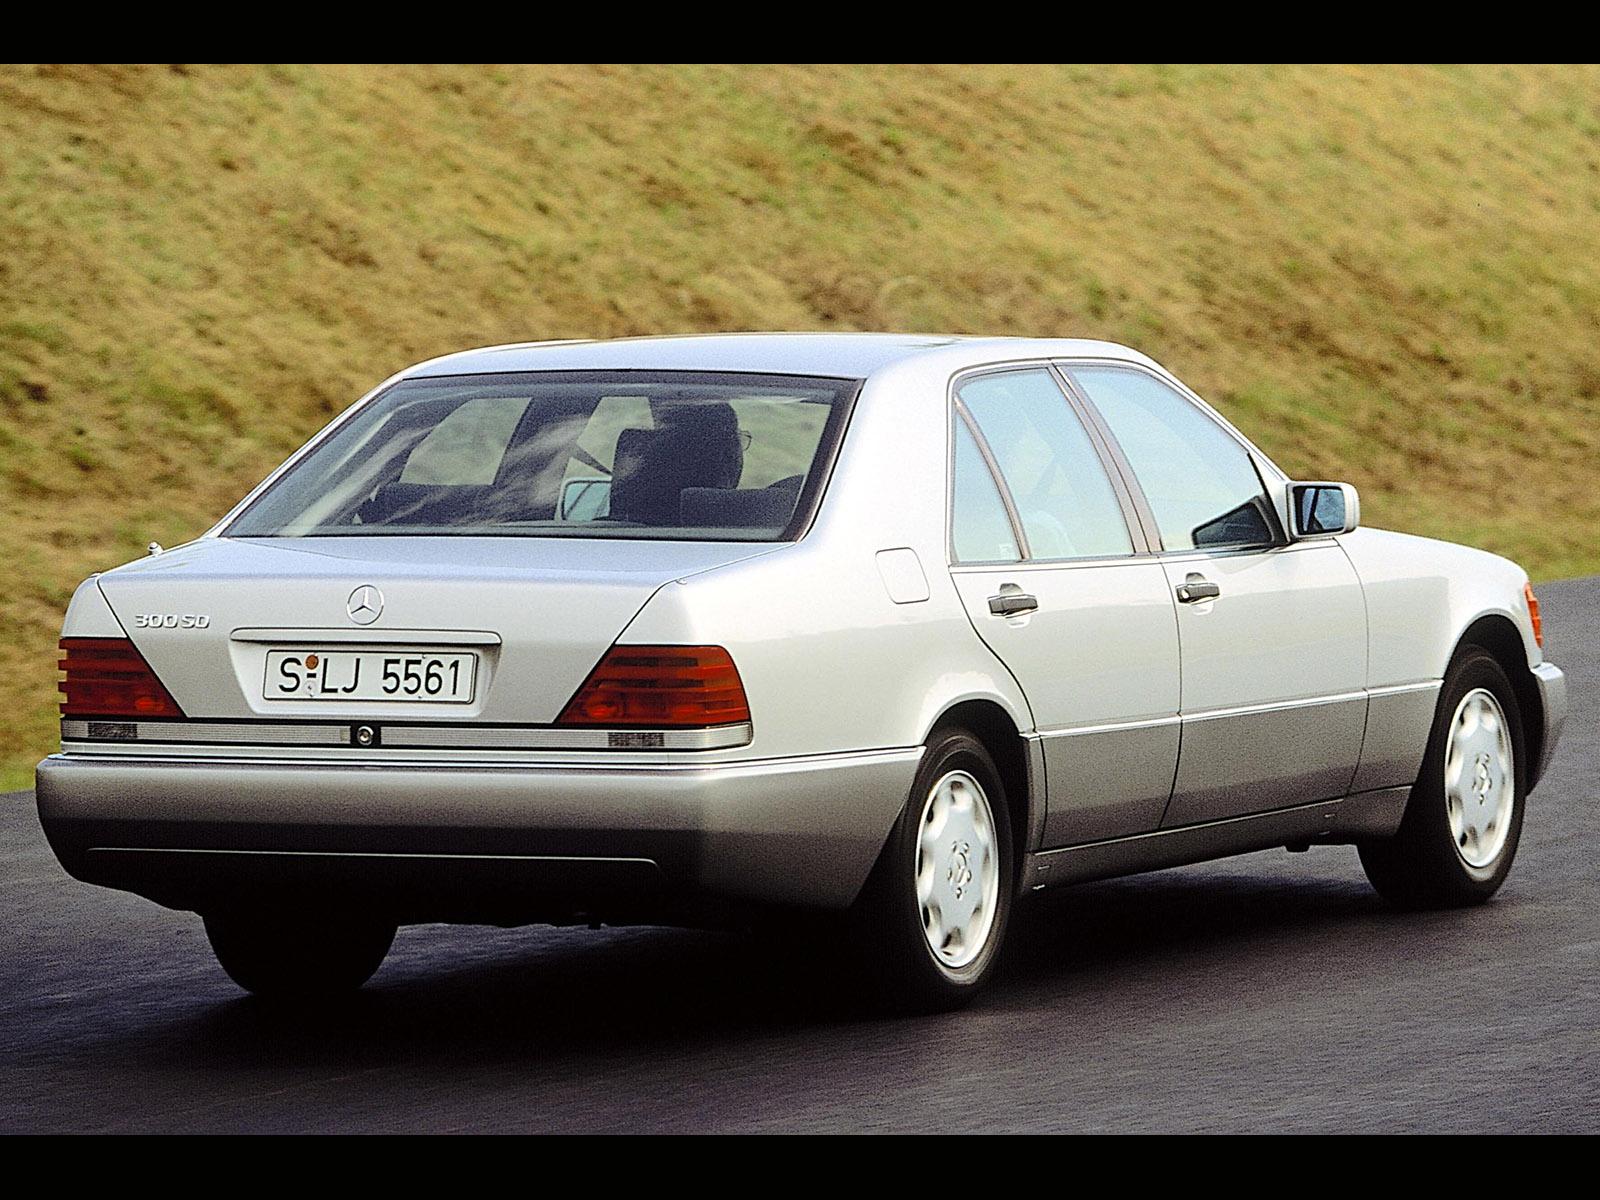 Mercedes benz s class w140 picture 39425 mercedes benz for Mercedes benz w140